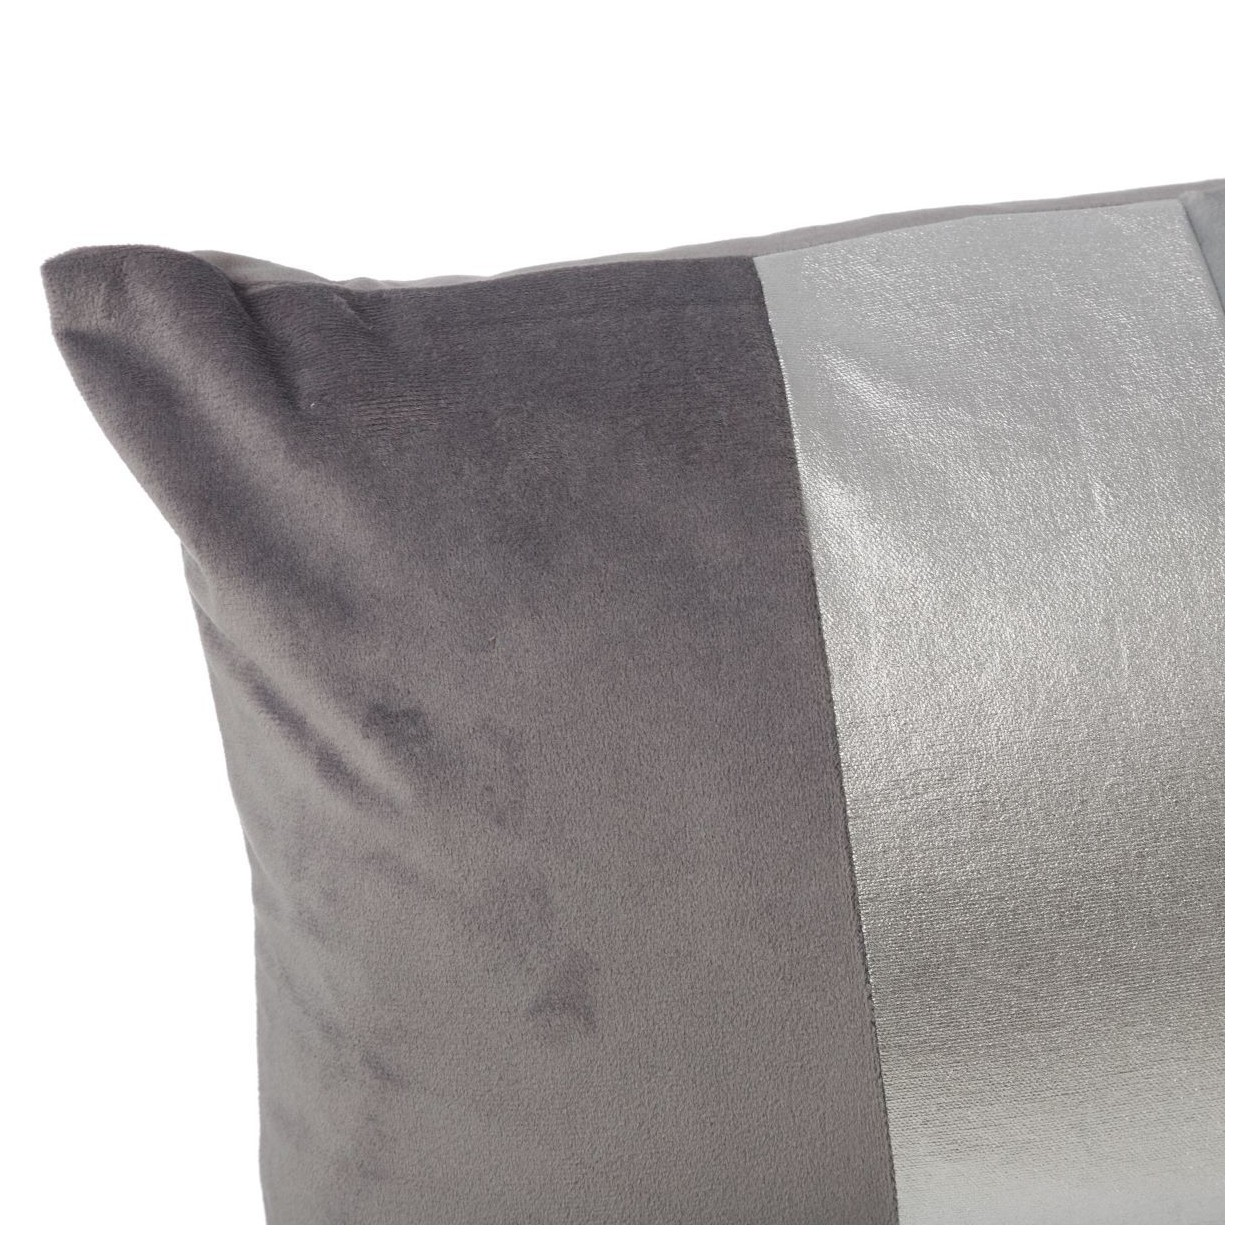 Coj n rectangular con relleno gris plata hogar y m s - Cortinas gris plata ...